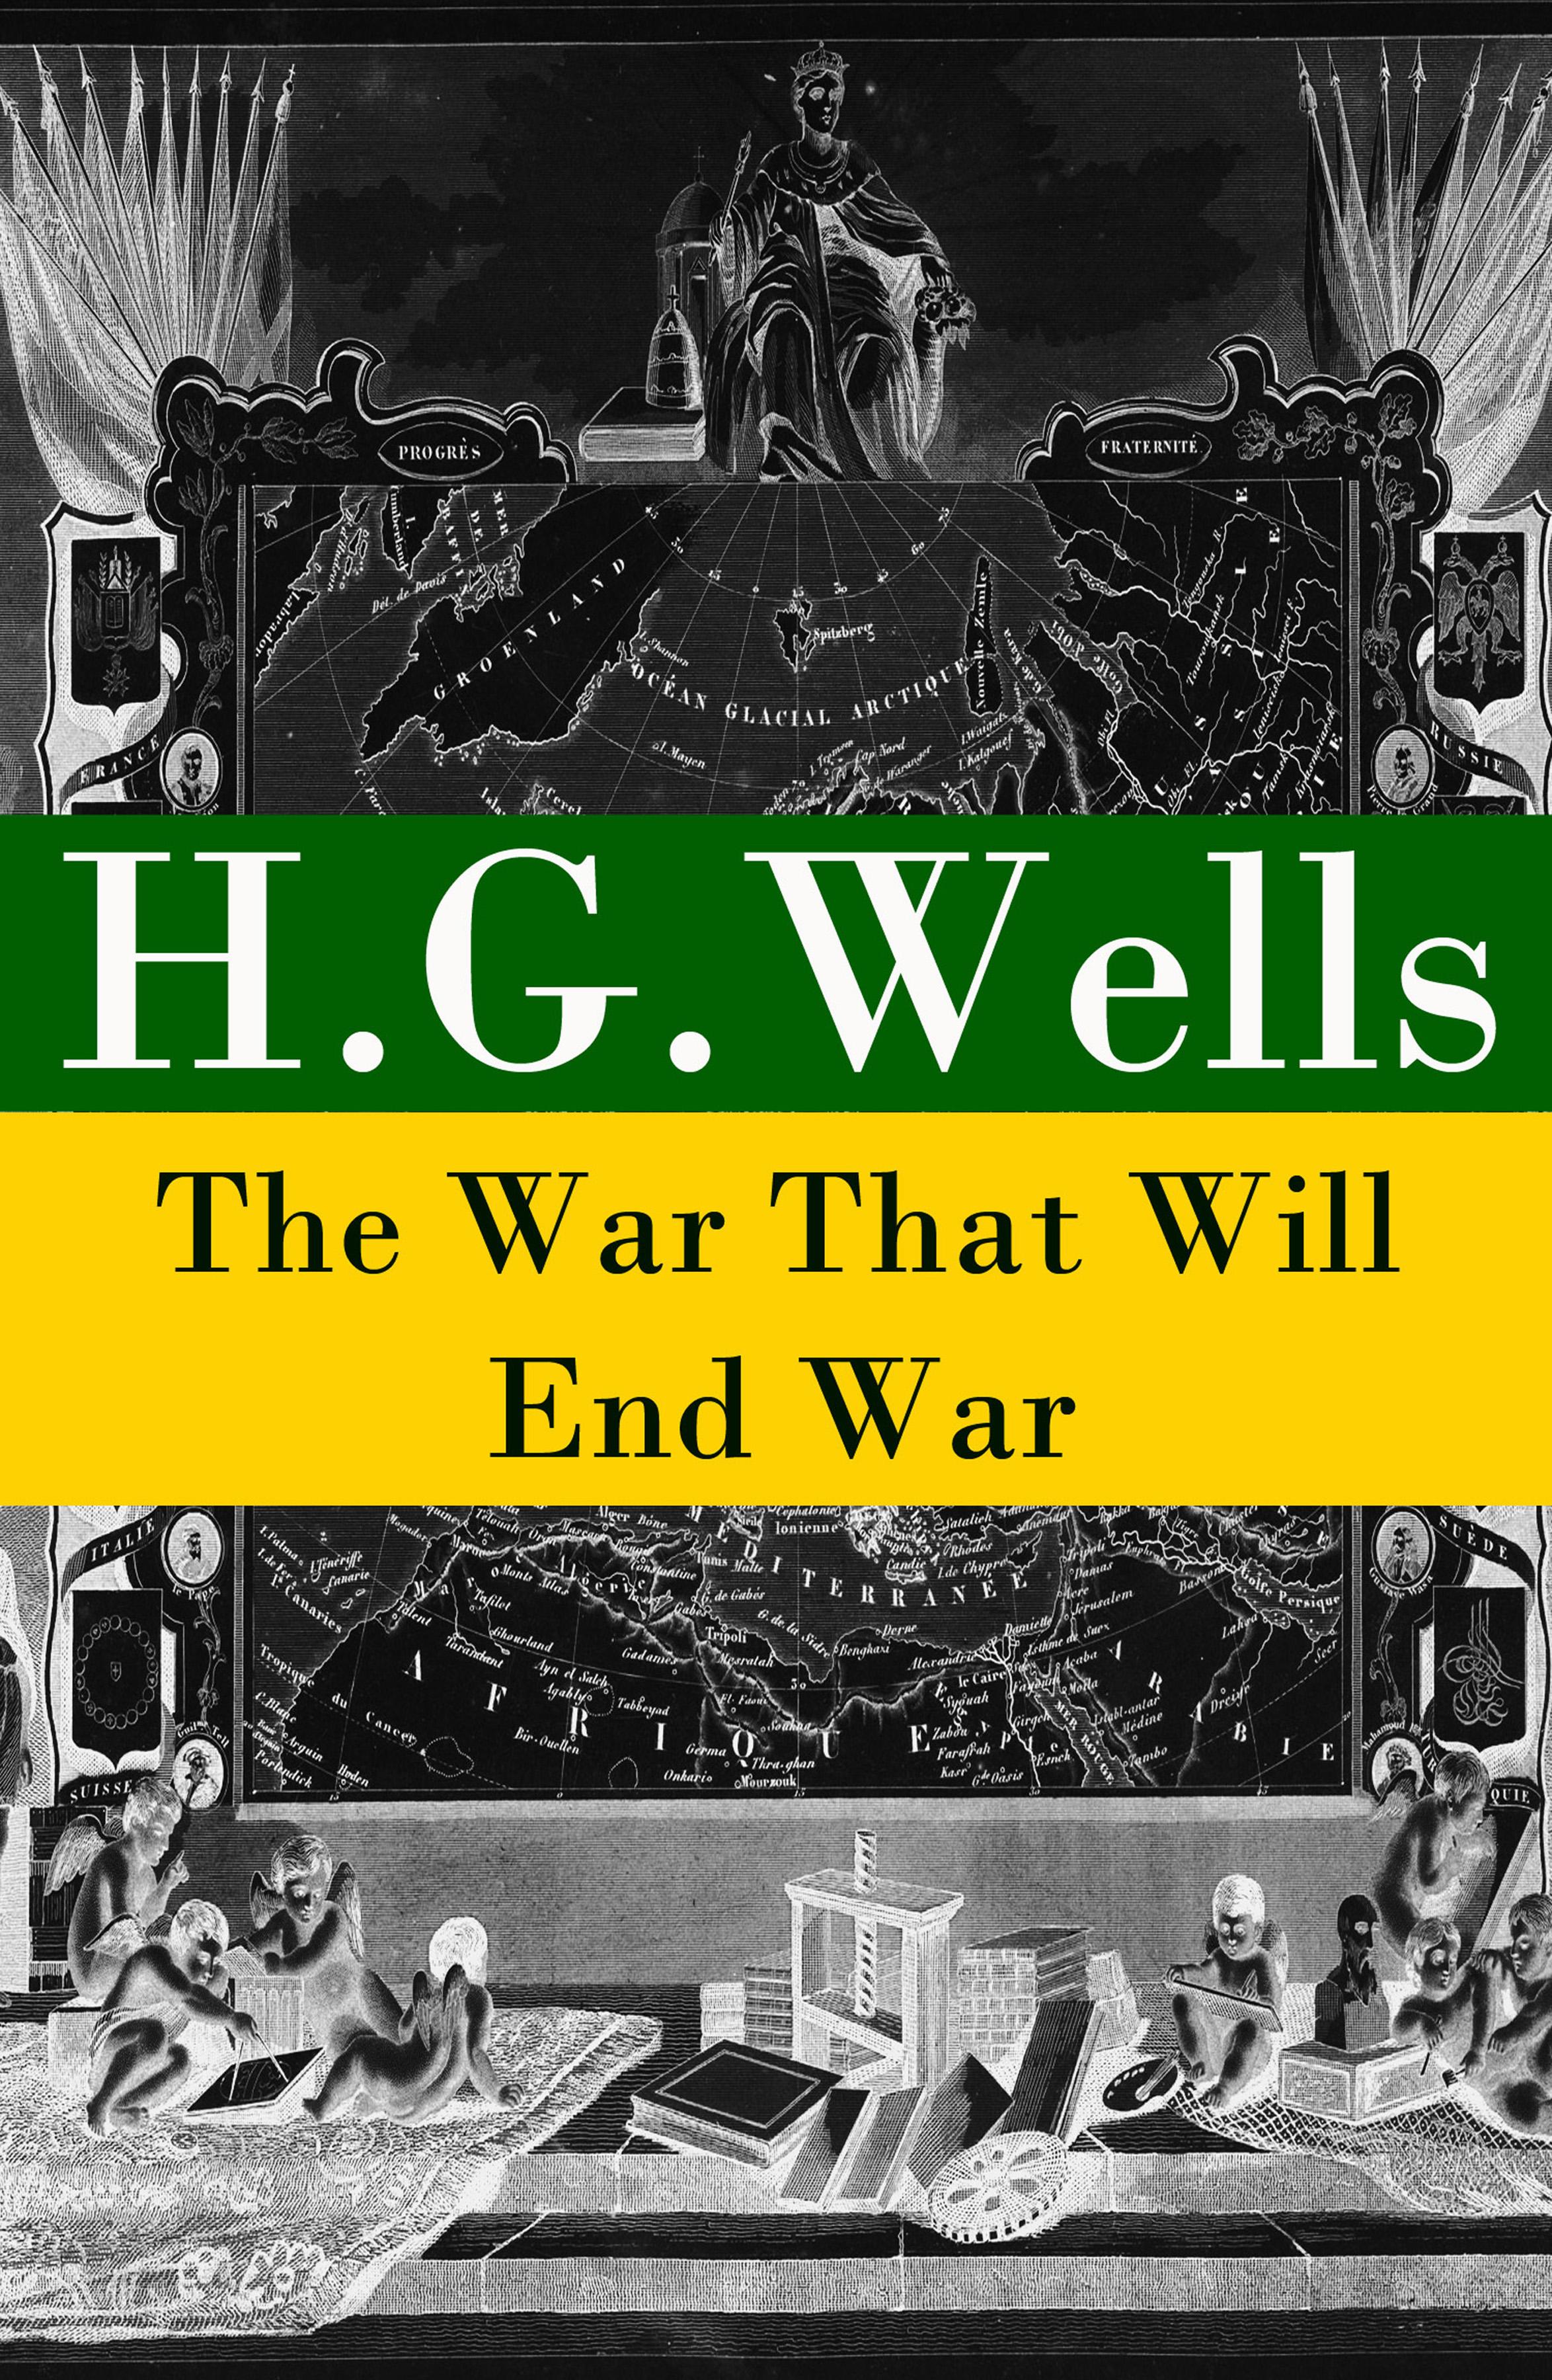 цена H. G. Wells The War That Will End War (The original unabridged edition) онлайн в 2017 году